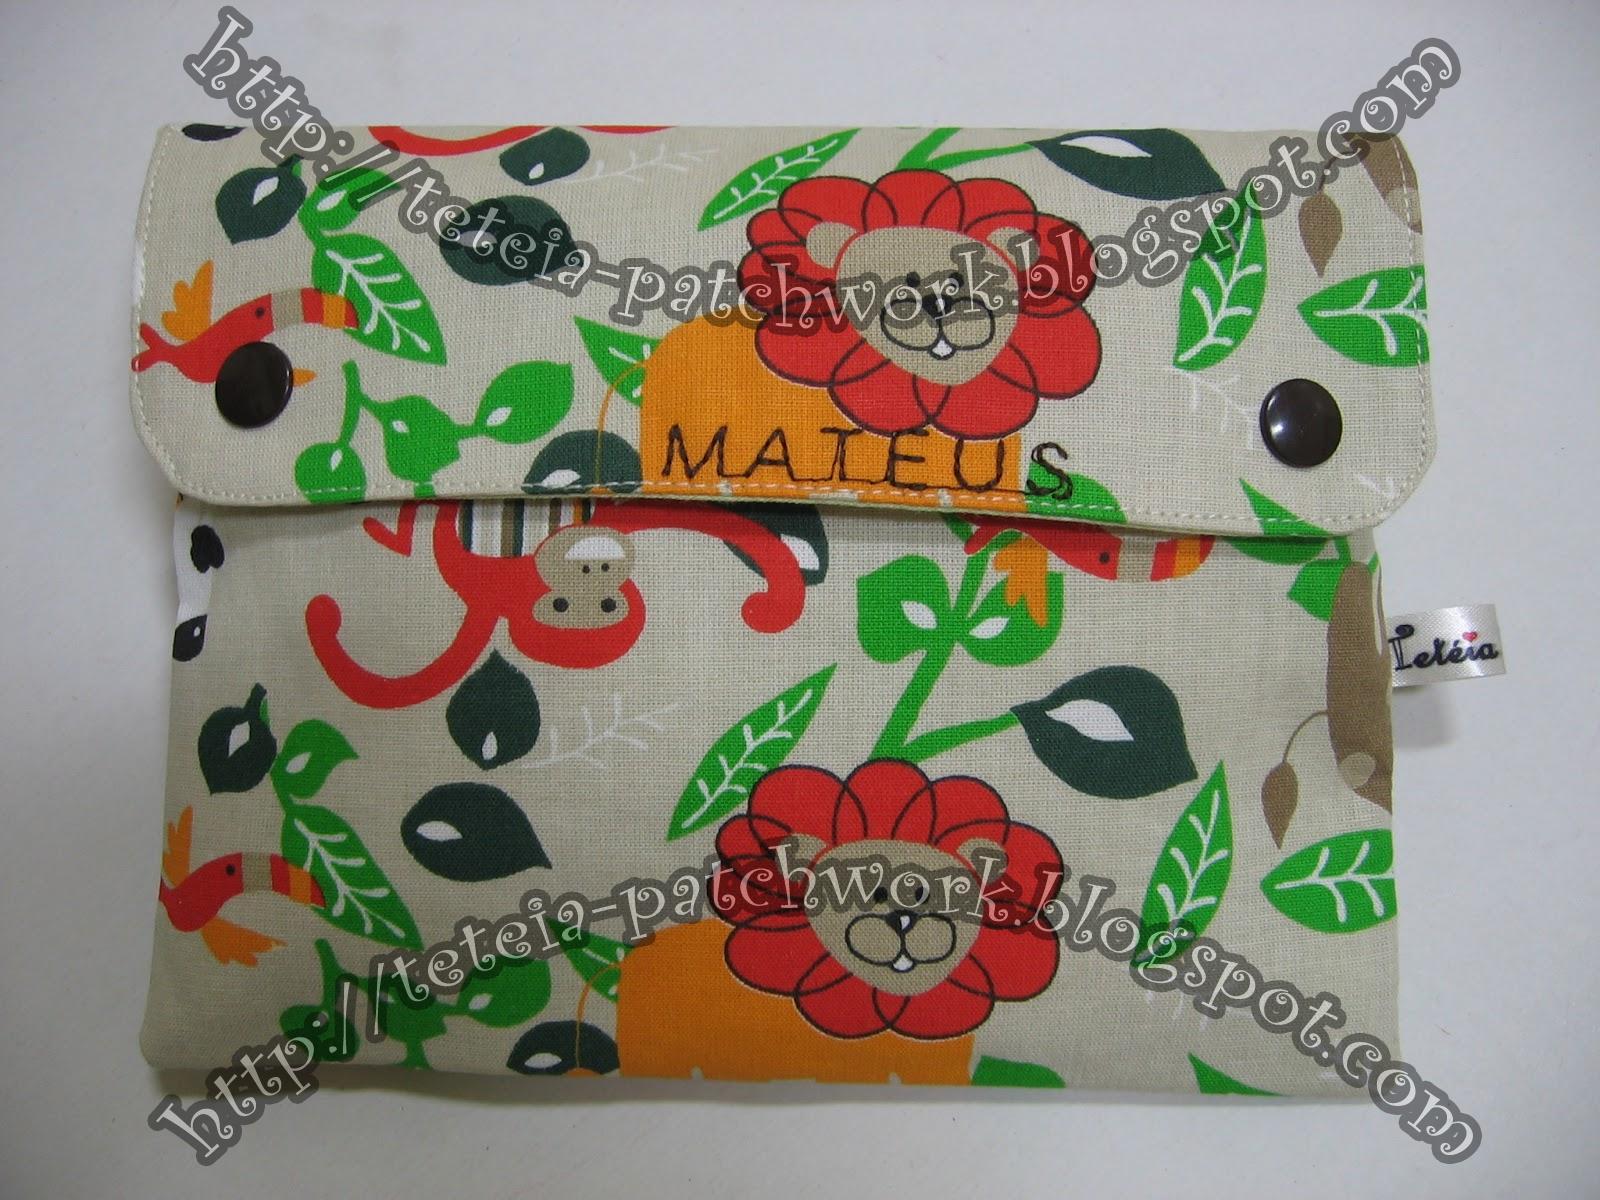 Tetéia Patchwork: Kit higiene bucal infantil floresta/ verde água  #B1691A 1600x1200